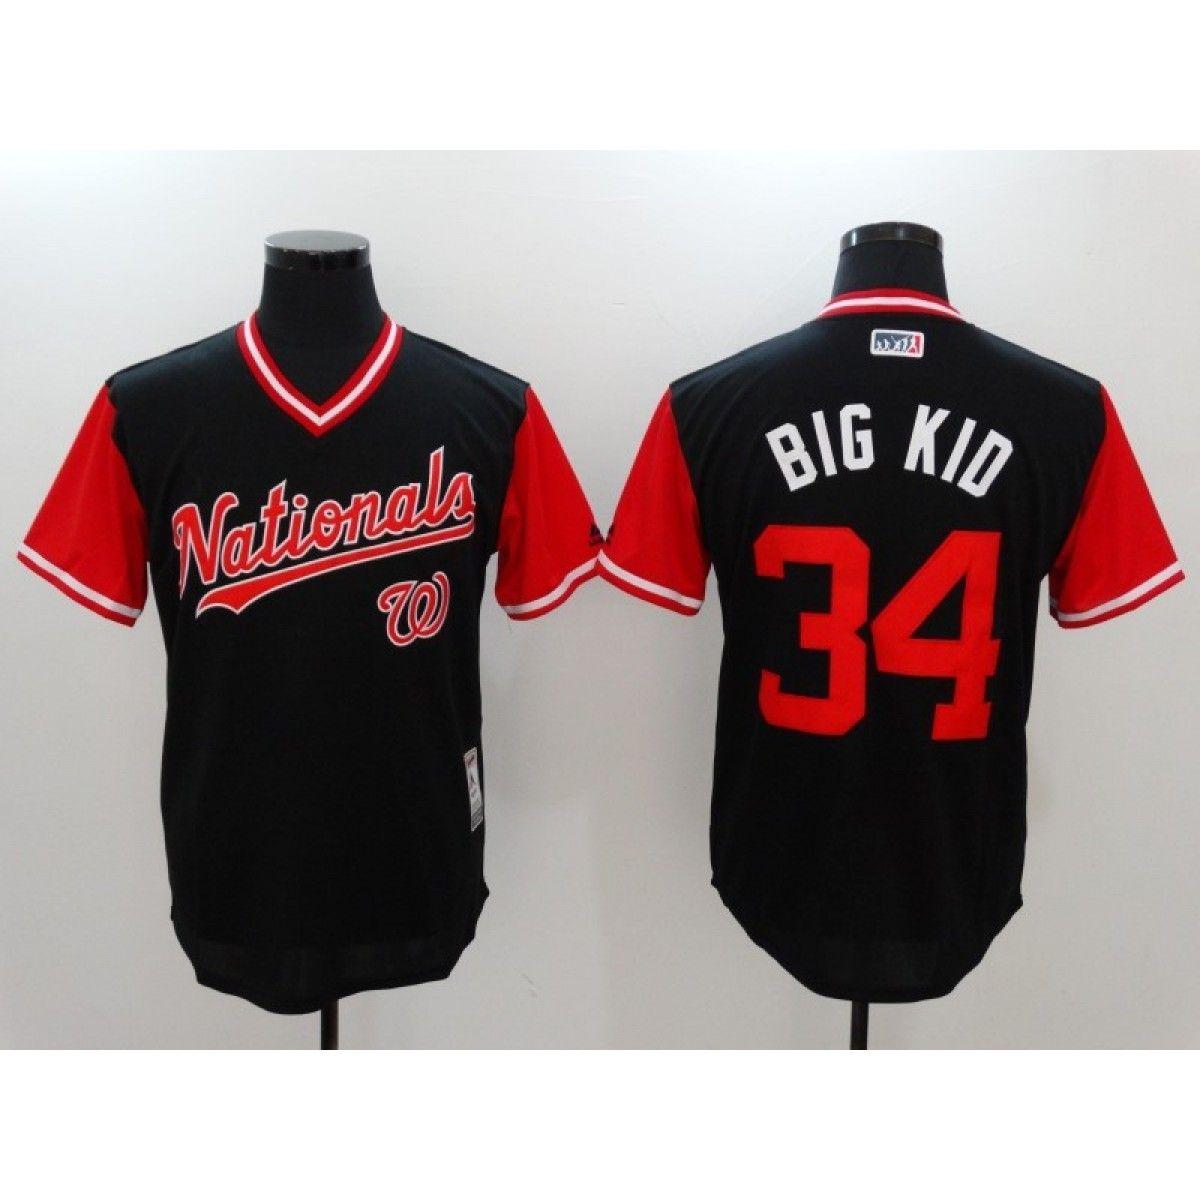 best authentic 436eb c0676 MLB Nationals 34 Bryce Harper Big Kid Majestic Navy 2017 ...